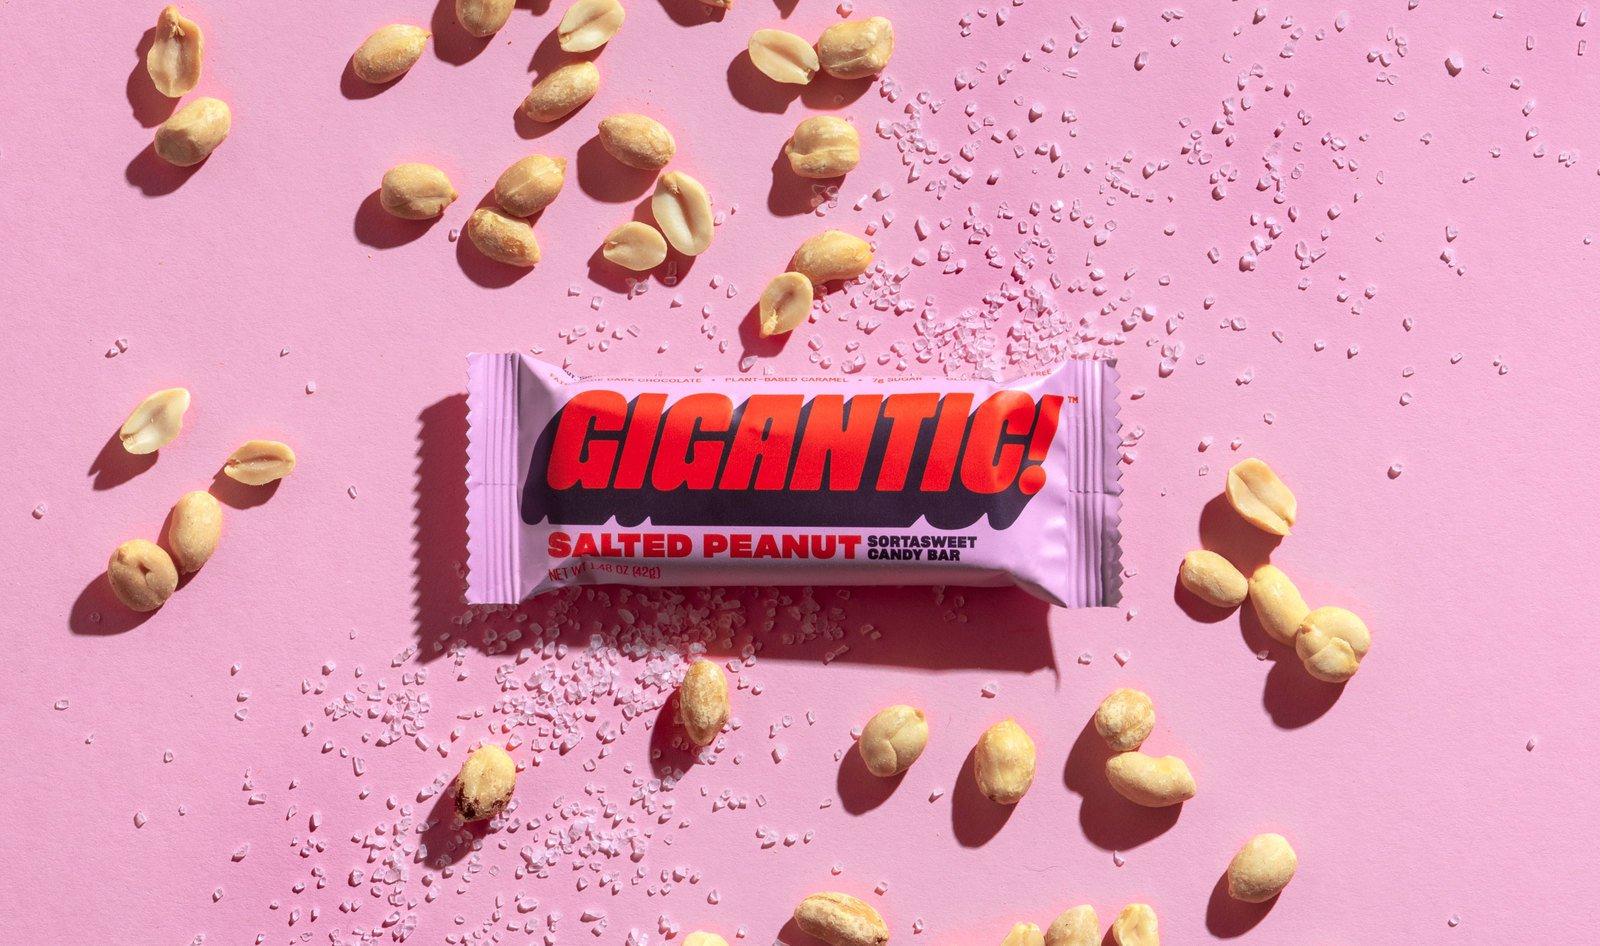 SharpGrotesk-GiganticCandy-02.jpg